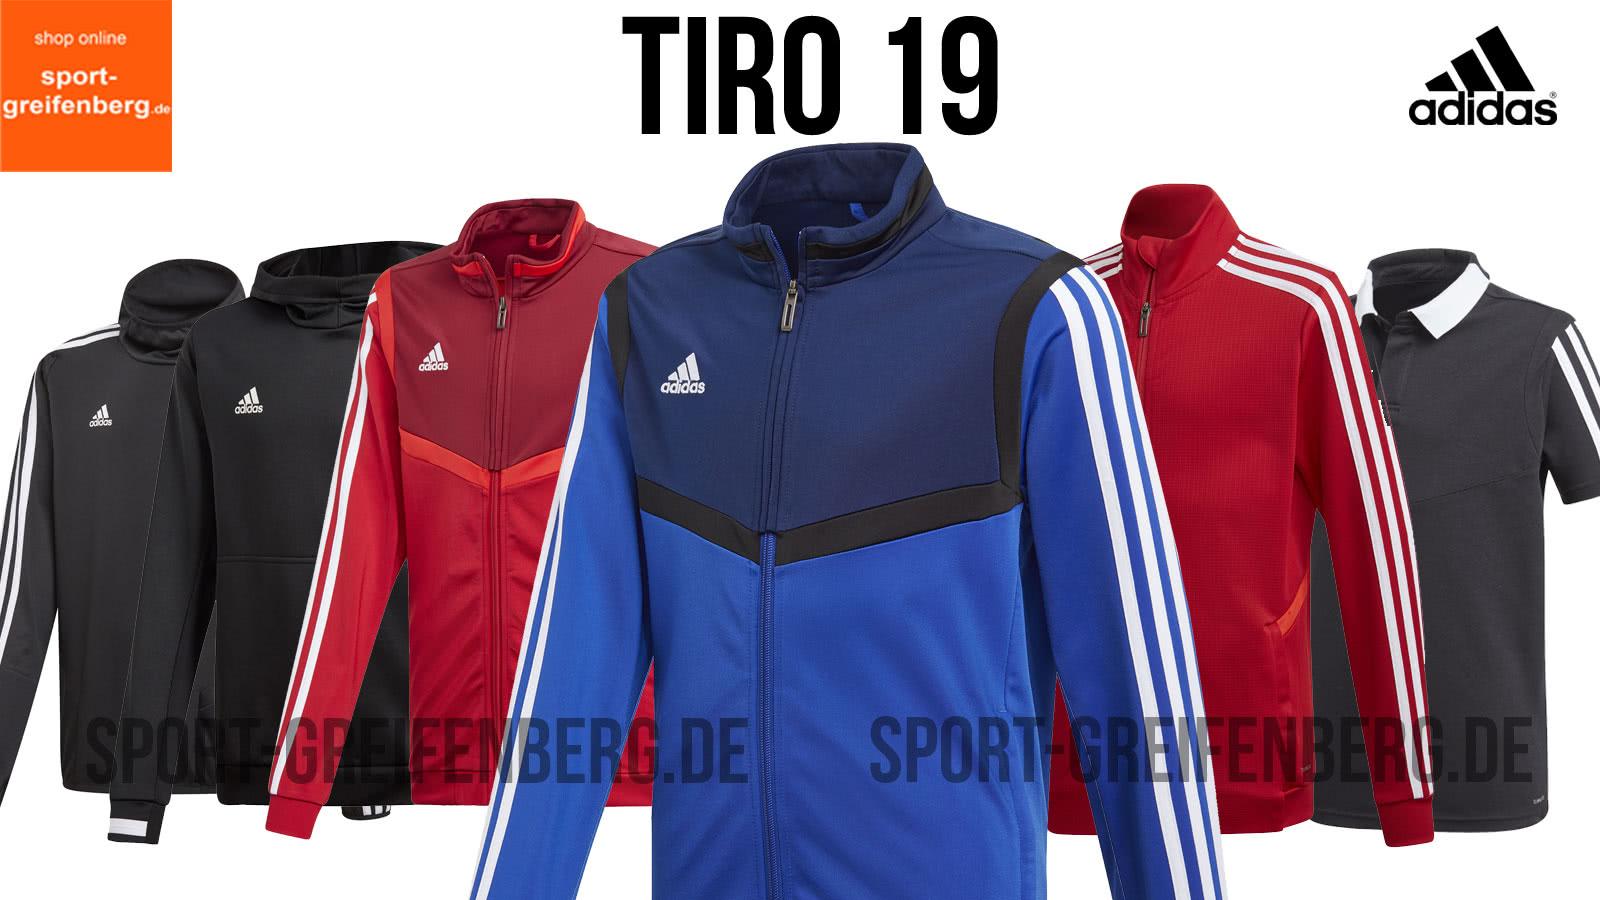 die adidas Tiro 19 Trainingsbekleidung